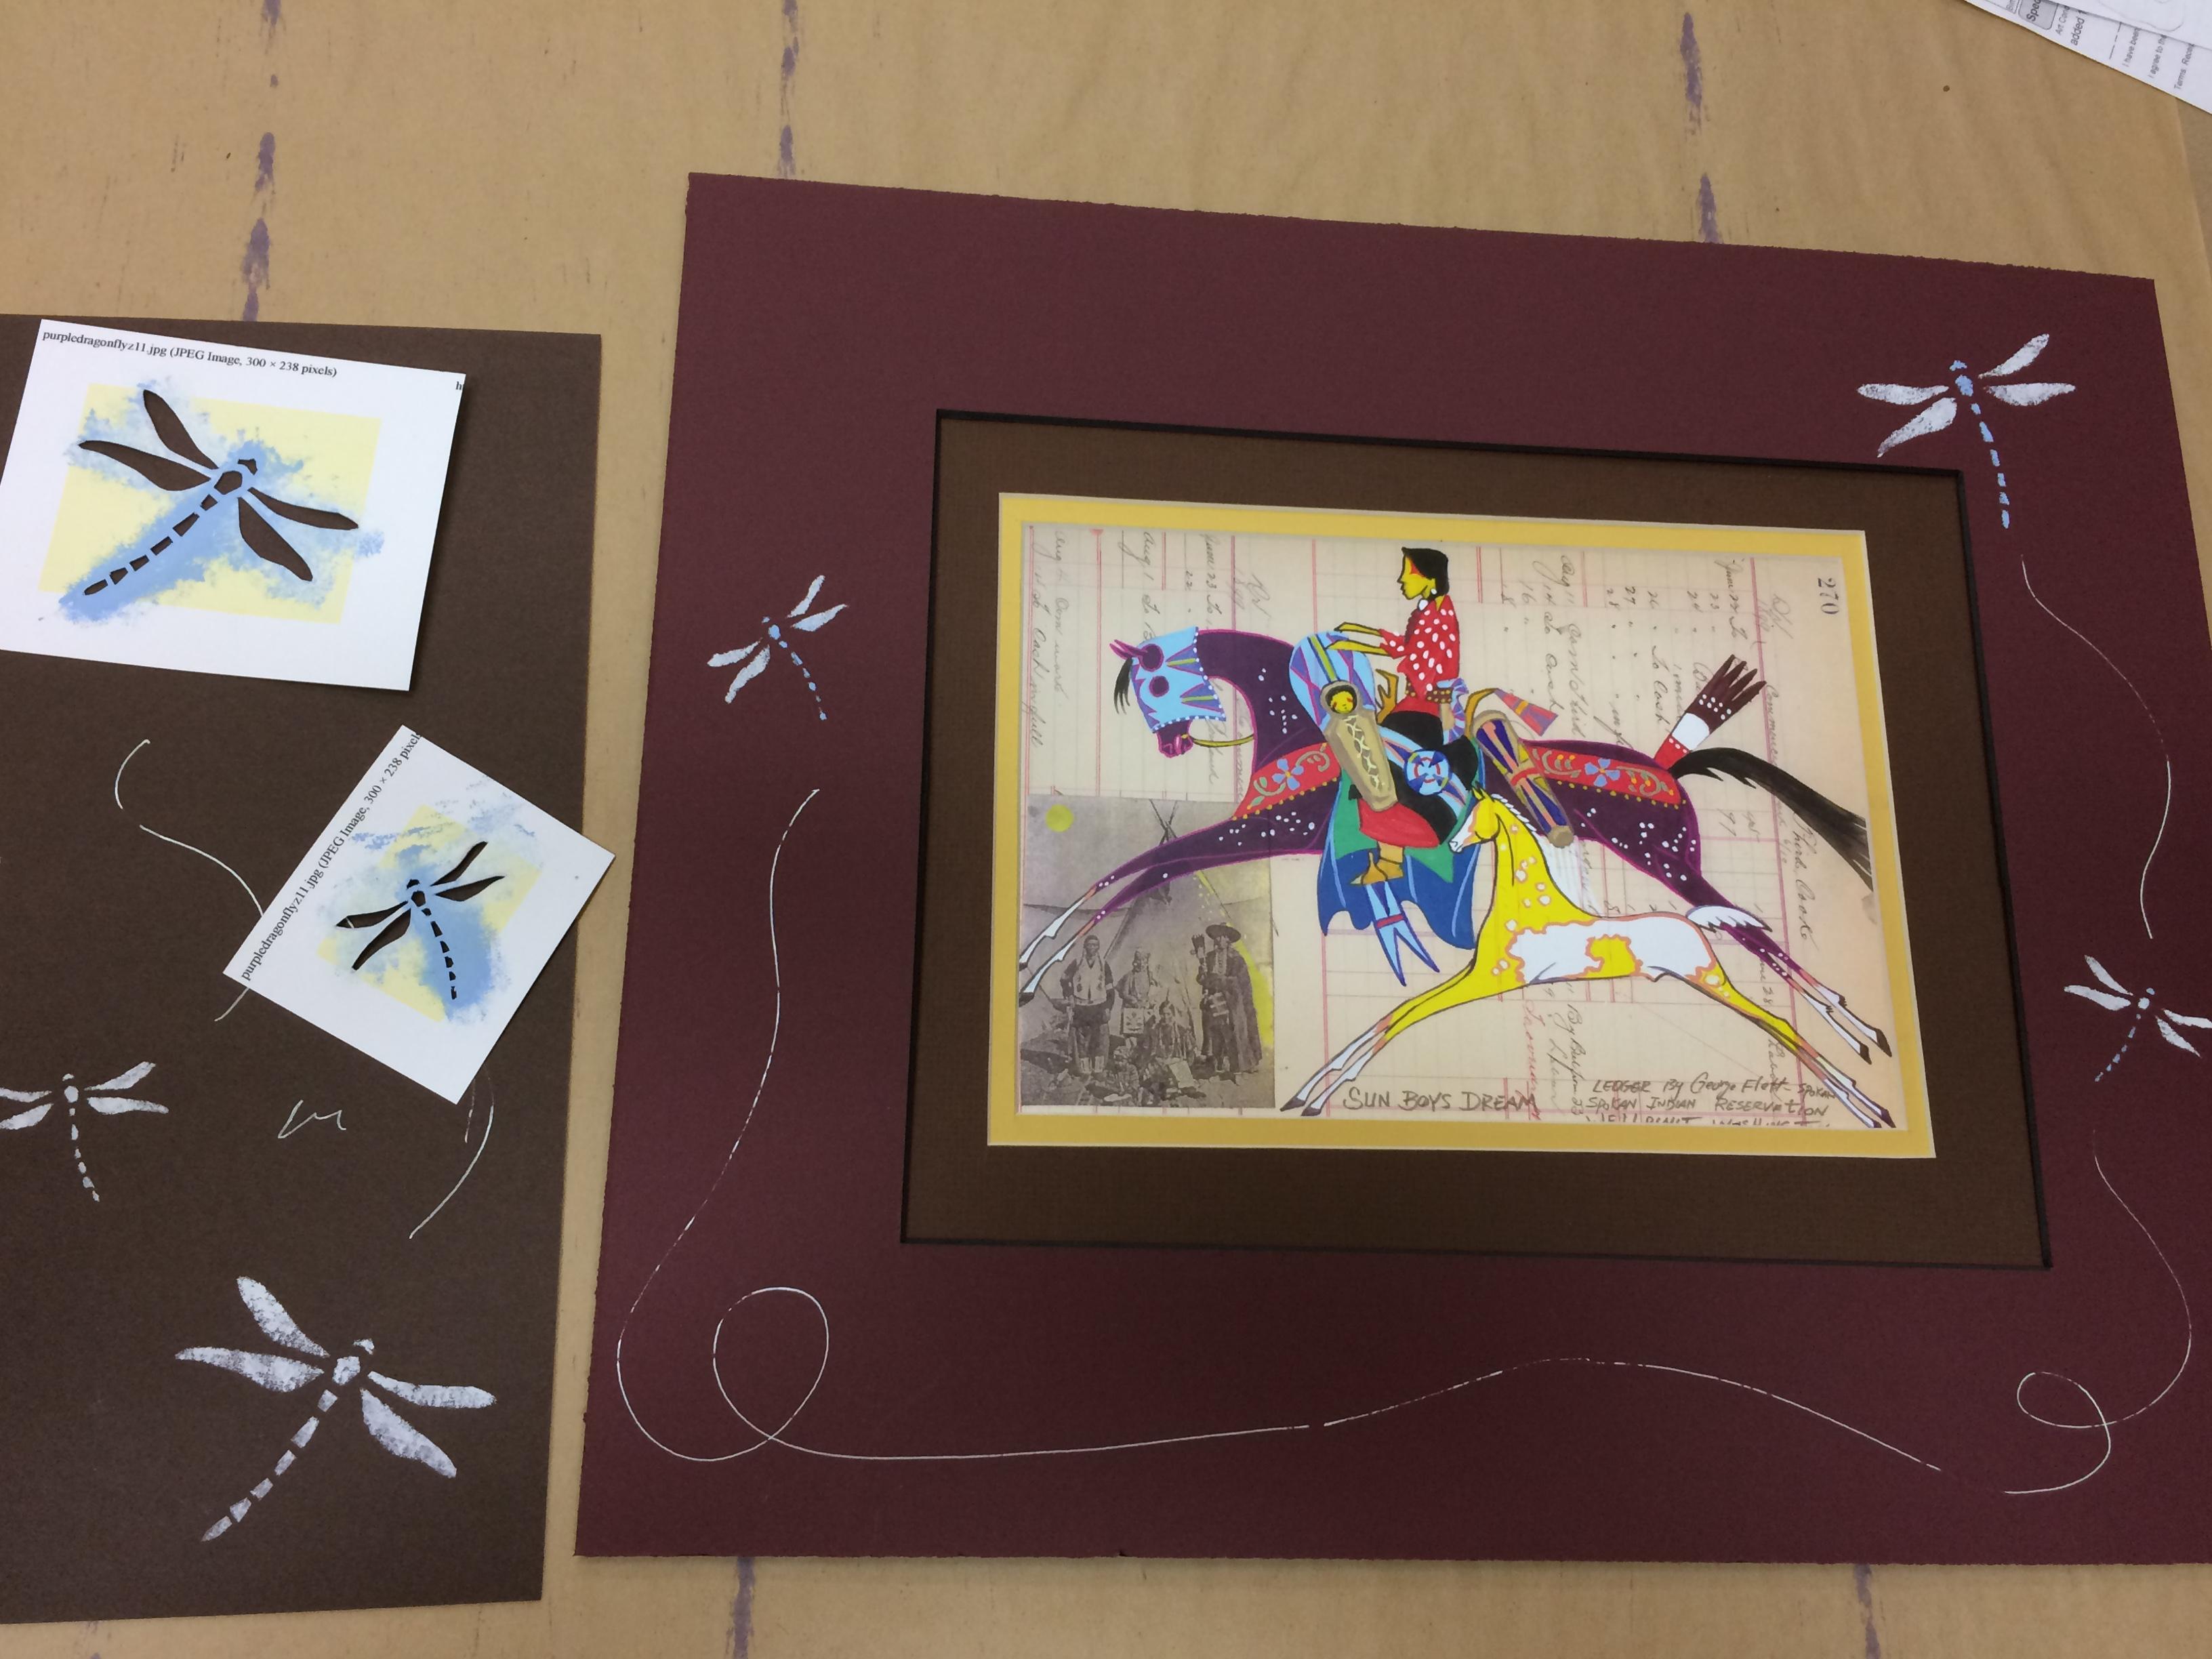 Creative Framing at Pendleton Art and Frame | Pendleton Art and Frame